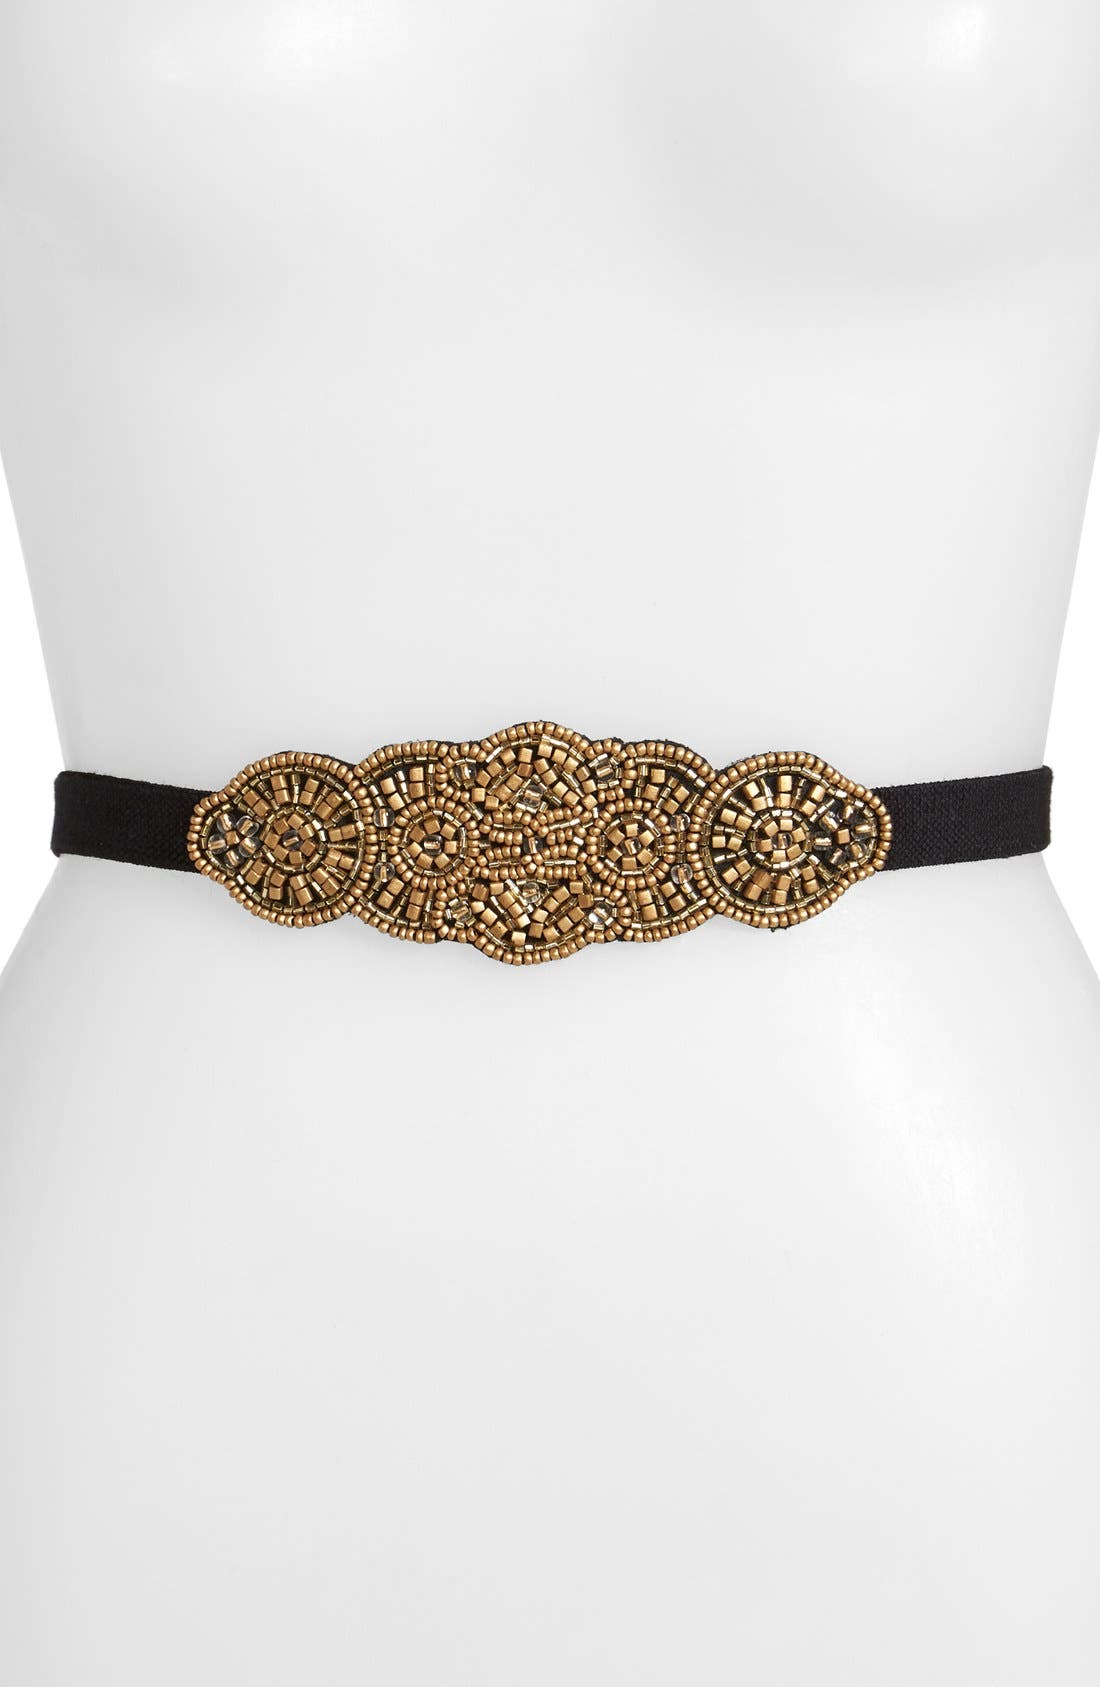 Alternate Image 1 Selected - Glint 'Medallion' Beaded Stretch Belt